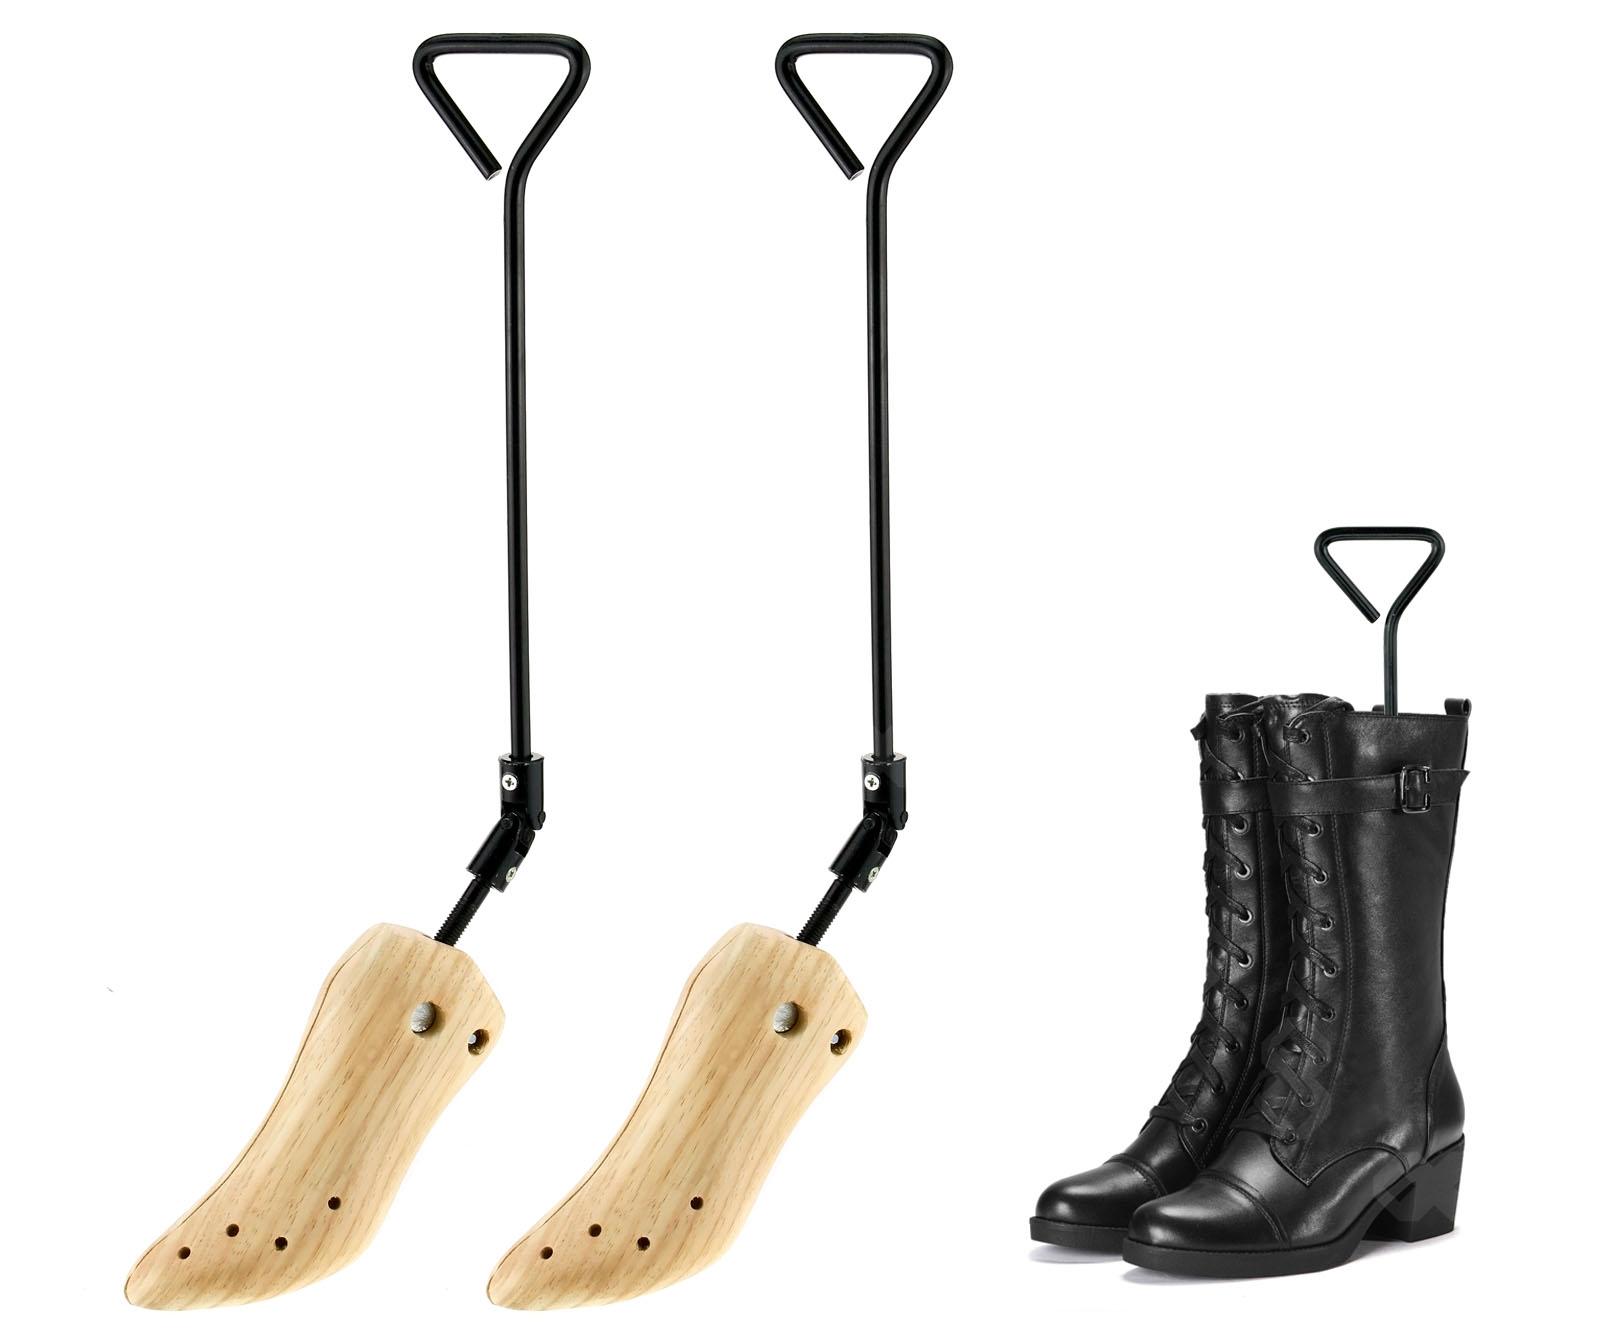 boot shaper wood boot shoe tree stretcher wooden uk size 4